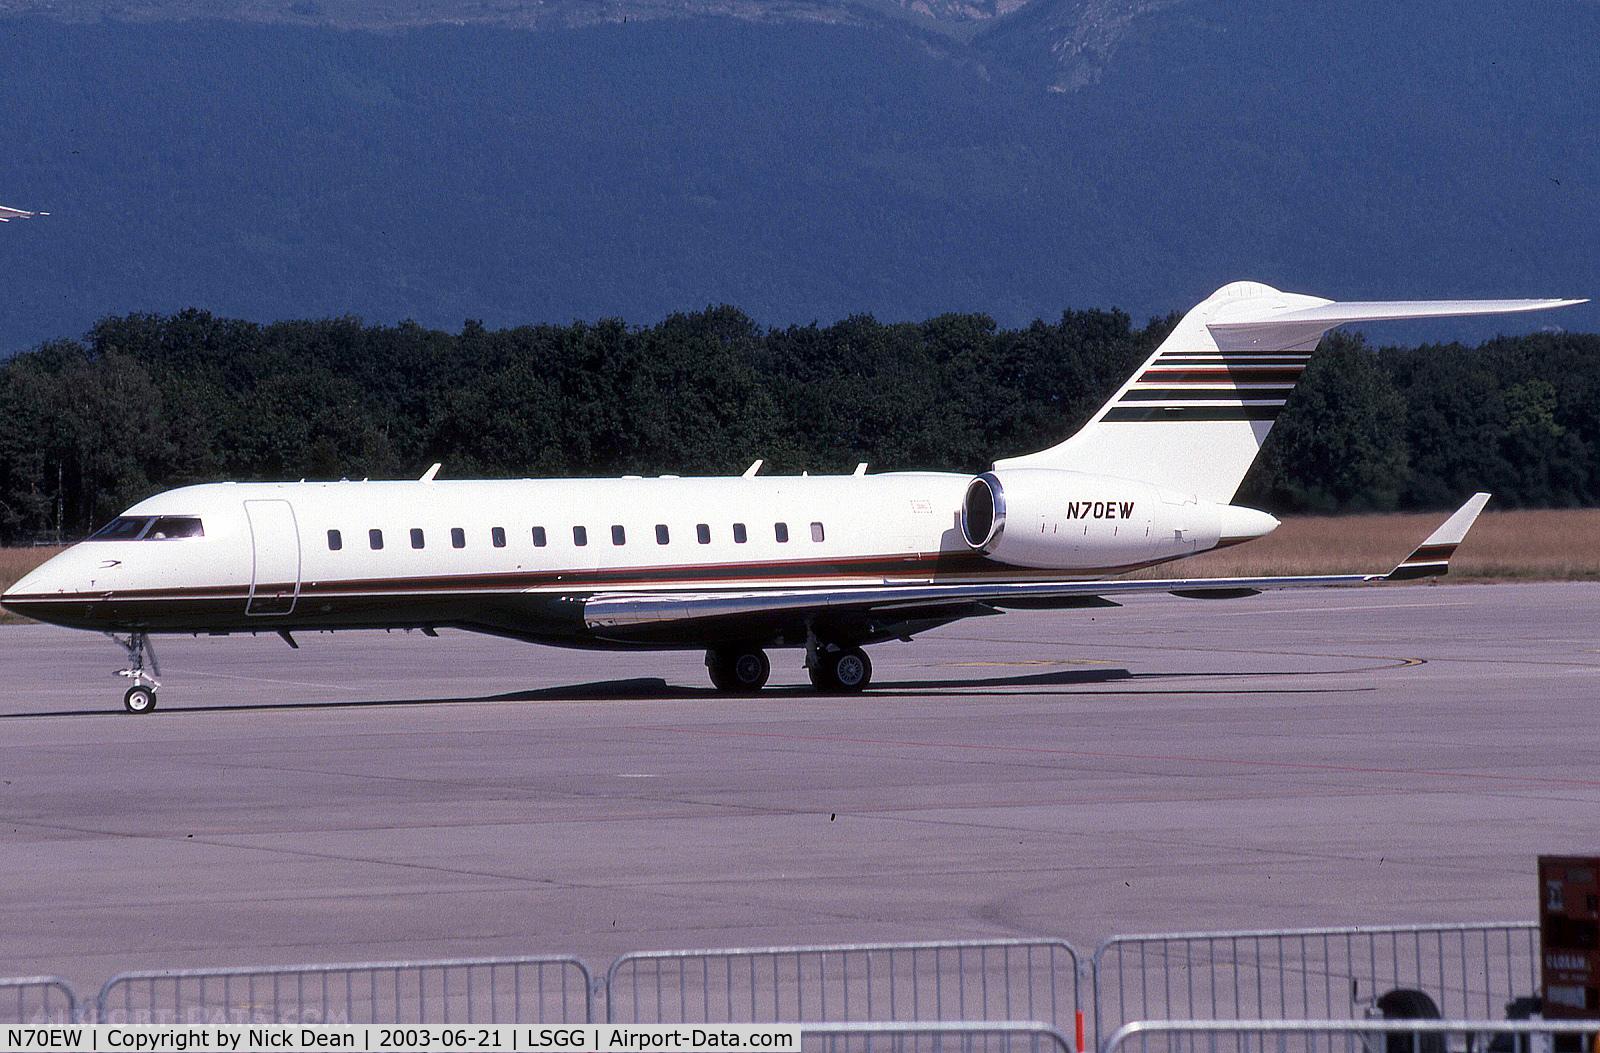 N70EW, 1999 Bombardier BD-700-1A10 Global Express C/N 9026, LSGG